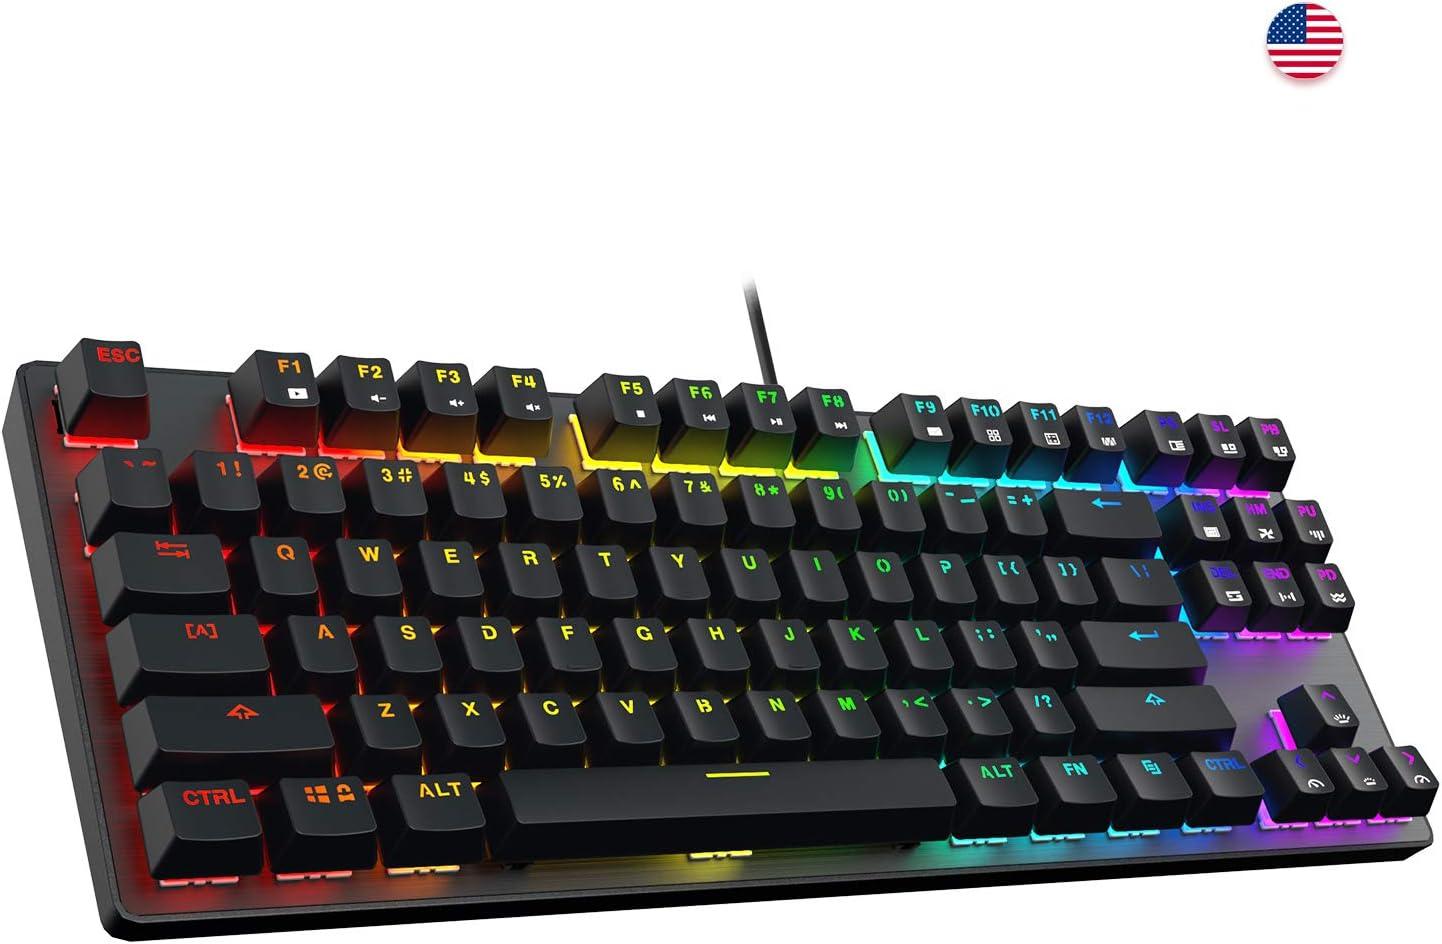 DREVO Tyrfing V2 Customizable RGB Compact 87 Keys Mechanical Gaming Keyboard USB Wired Tenkeyless Programming Macro Media Control Software Support Outemu Brown Switch Black